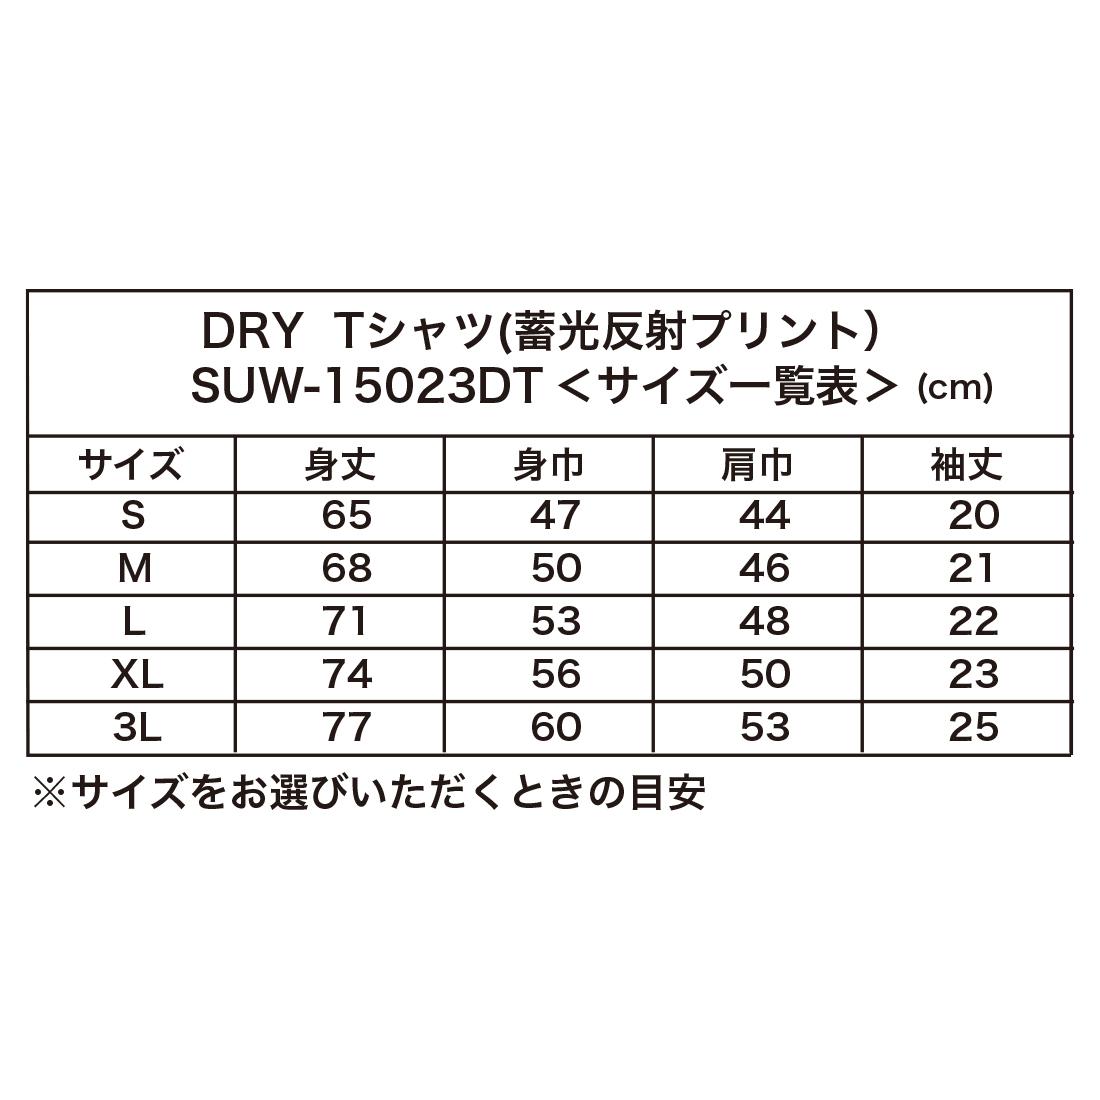 DRY Tシャツ(蓄光反射プリント) SUW−15023DT